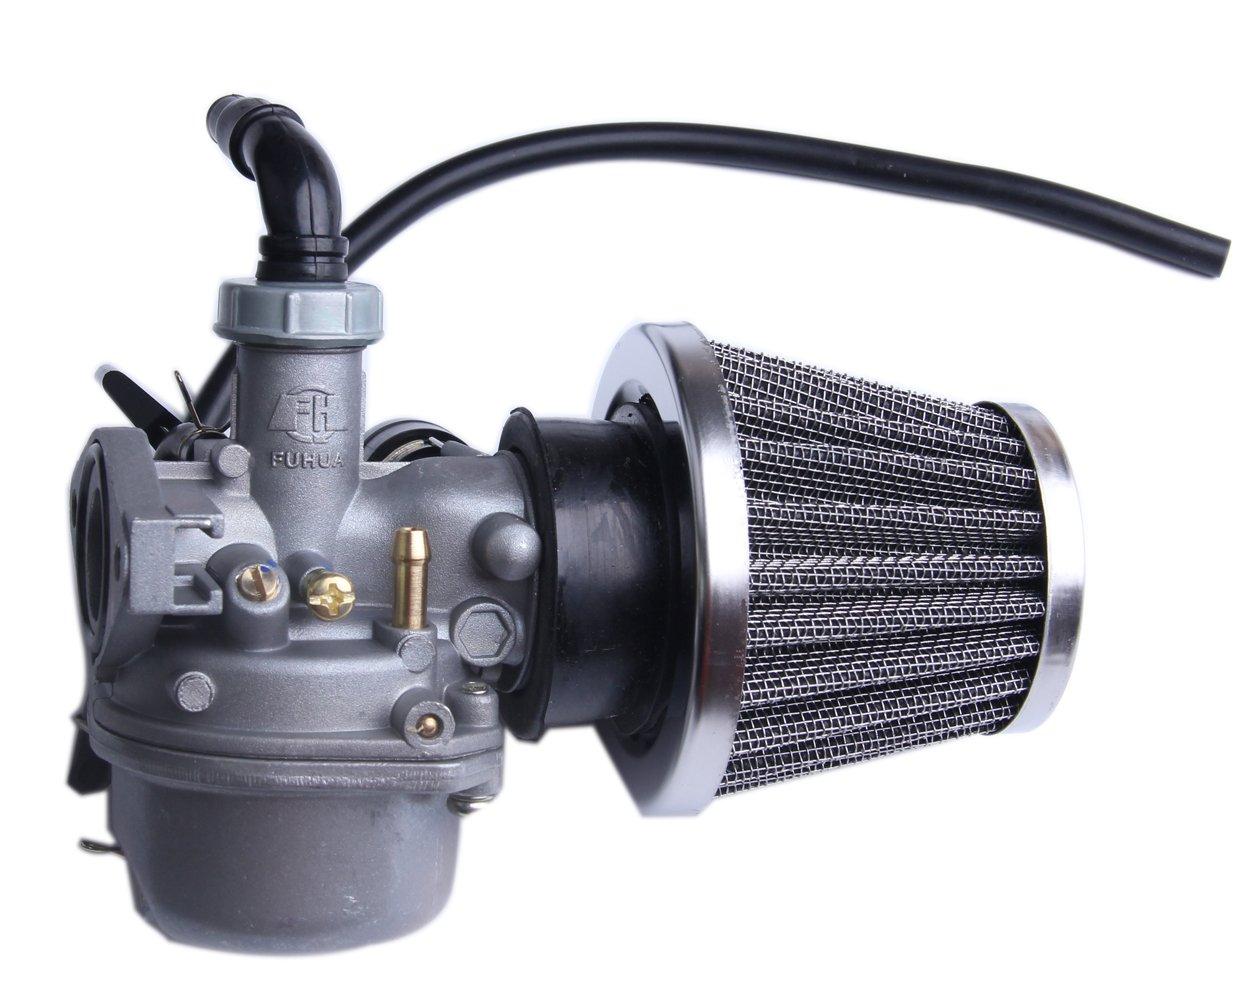 ATV Carburetor PZ19 with Fuel Filter and 35mm Air Filter for 50cc 70cc 90cc 110cc 125cc ATV Dirt Pit Bike Taotao Honda CRF Go-Kart Carb SUNL BH-MOTOR